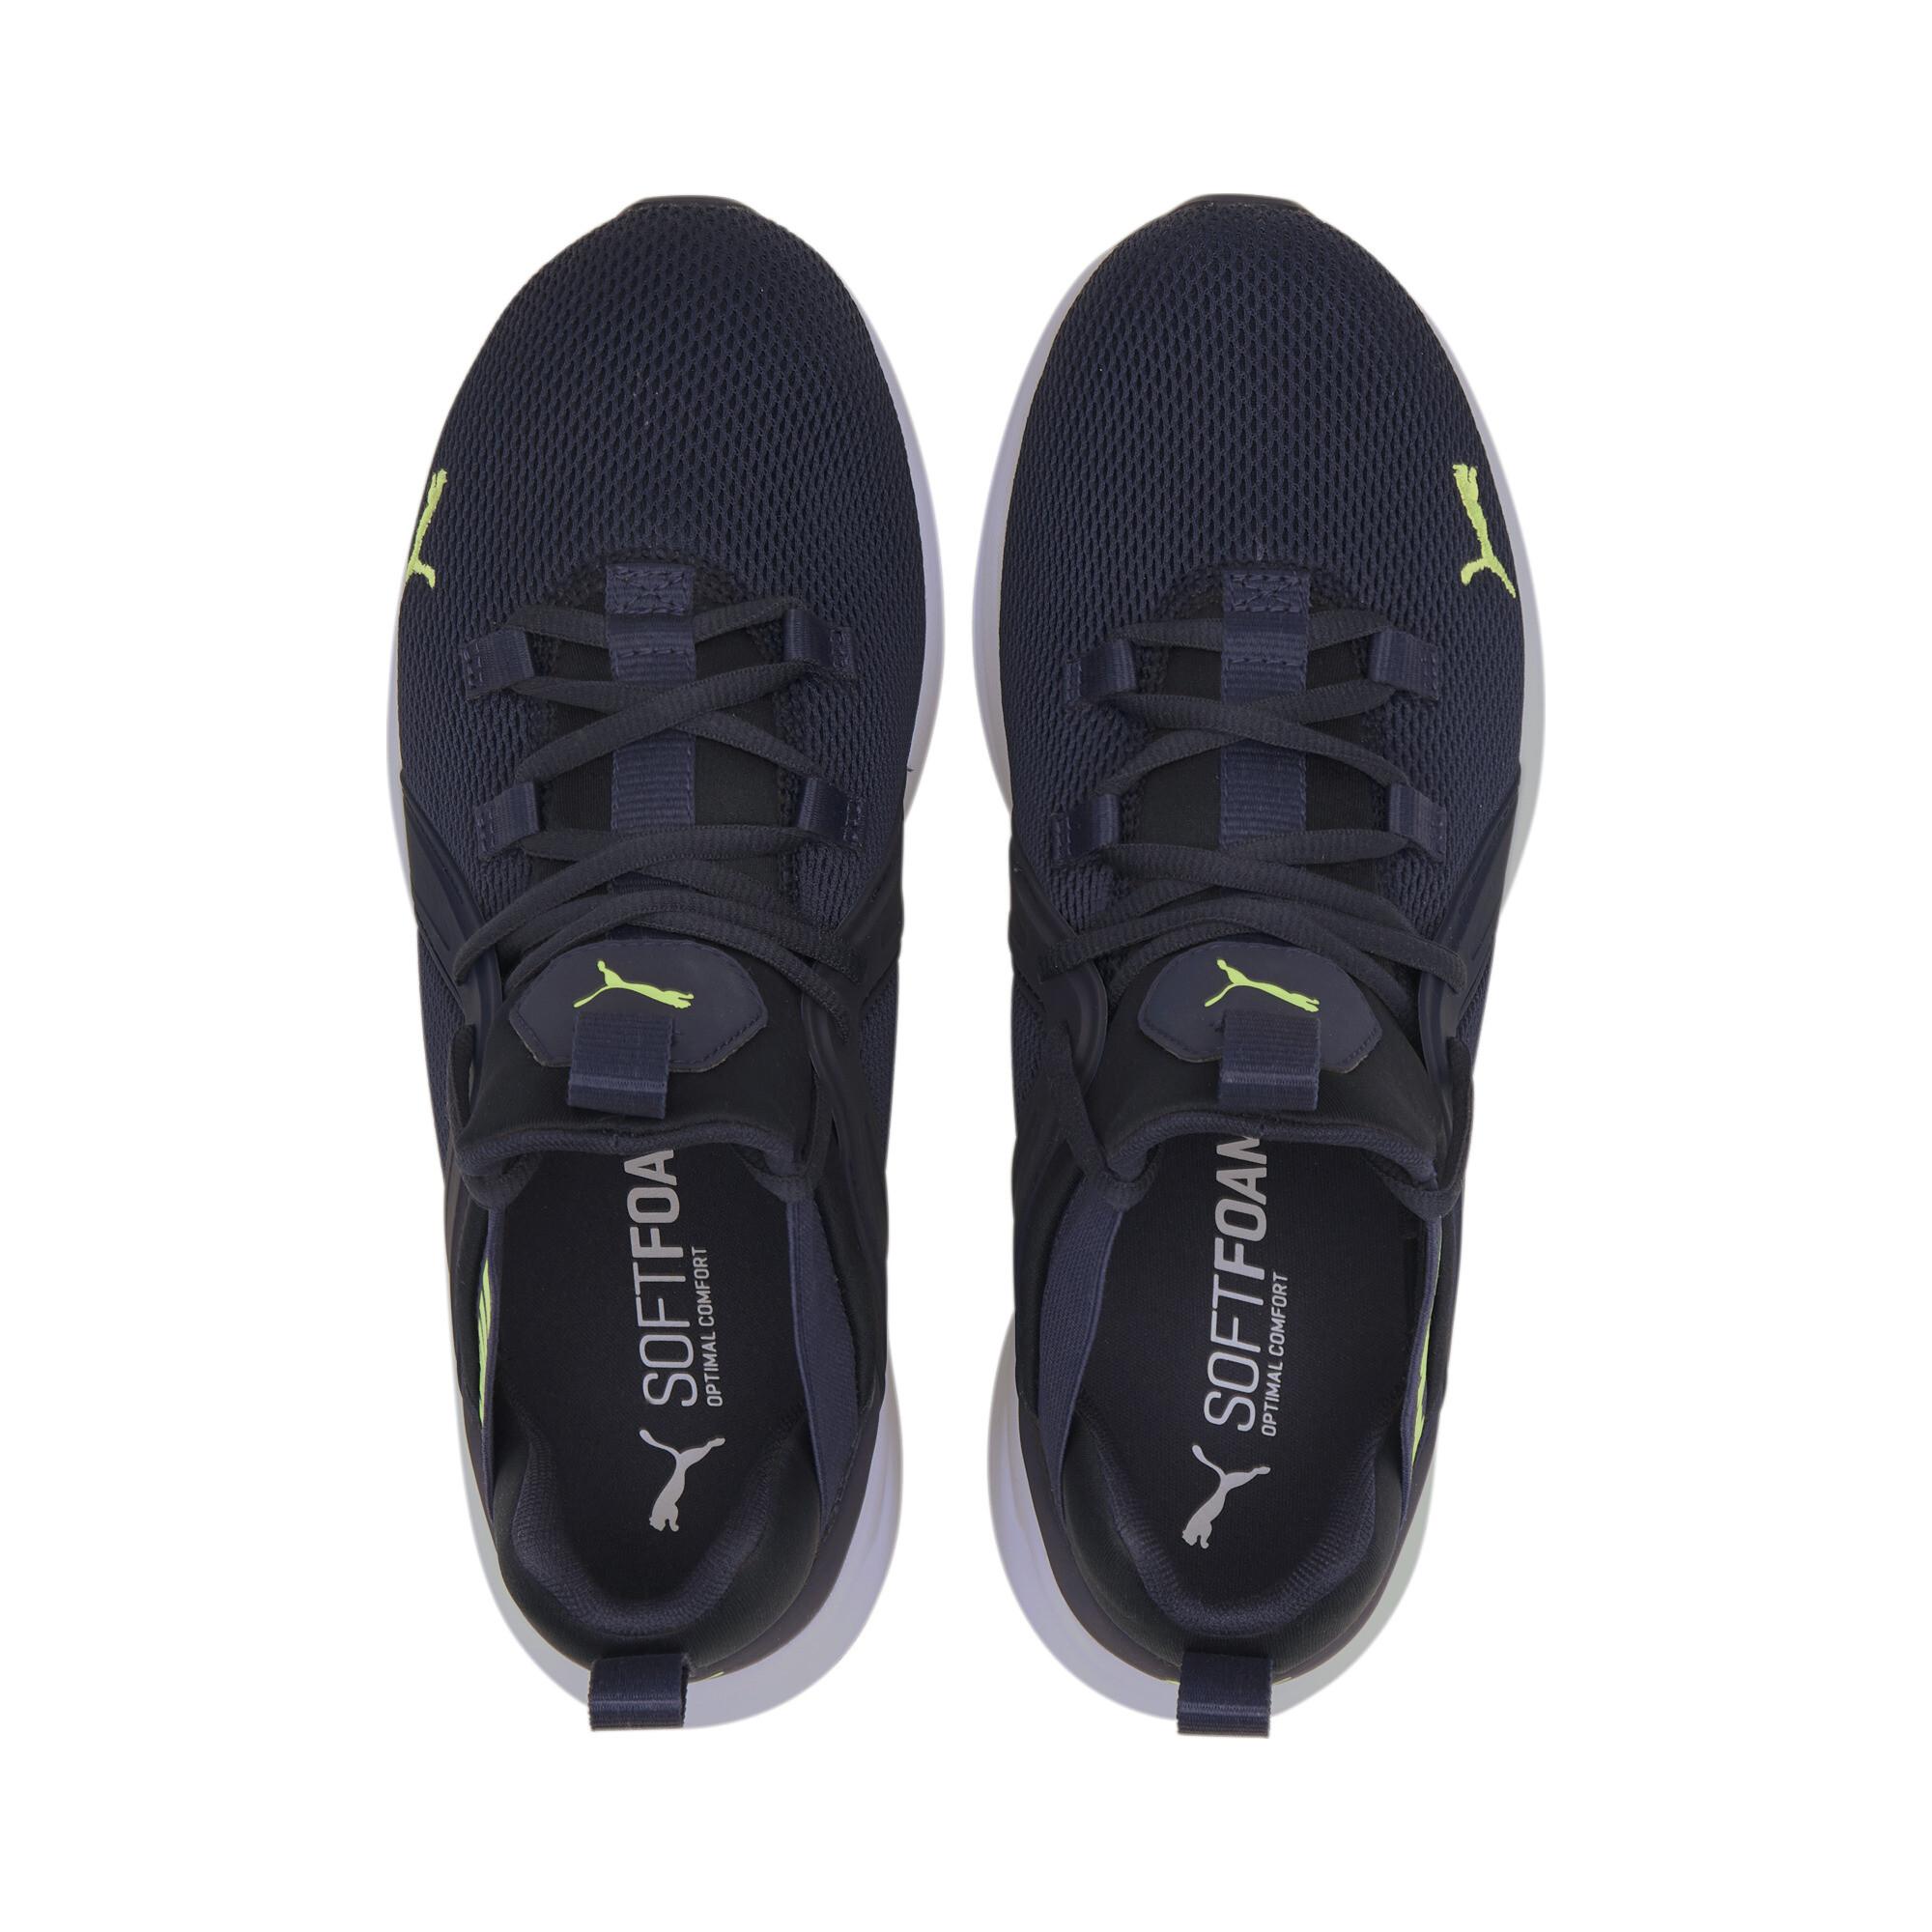 PUMA-Men-039-s-Enzo-2-Training-Shoes thumbnail 27